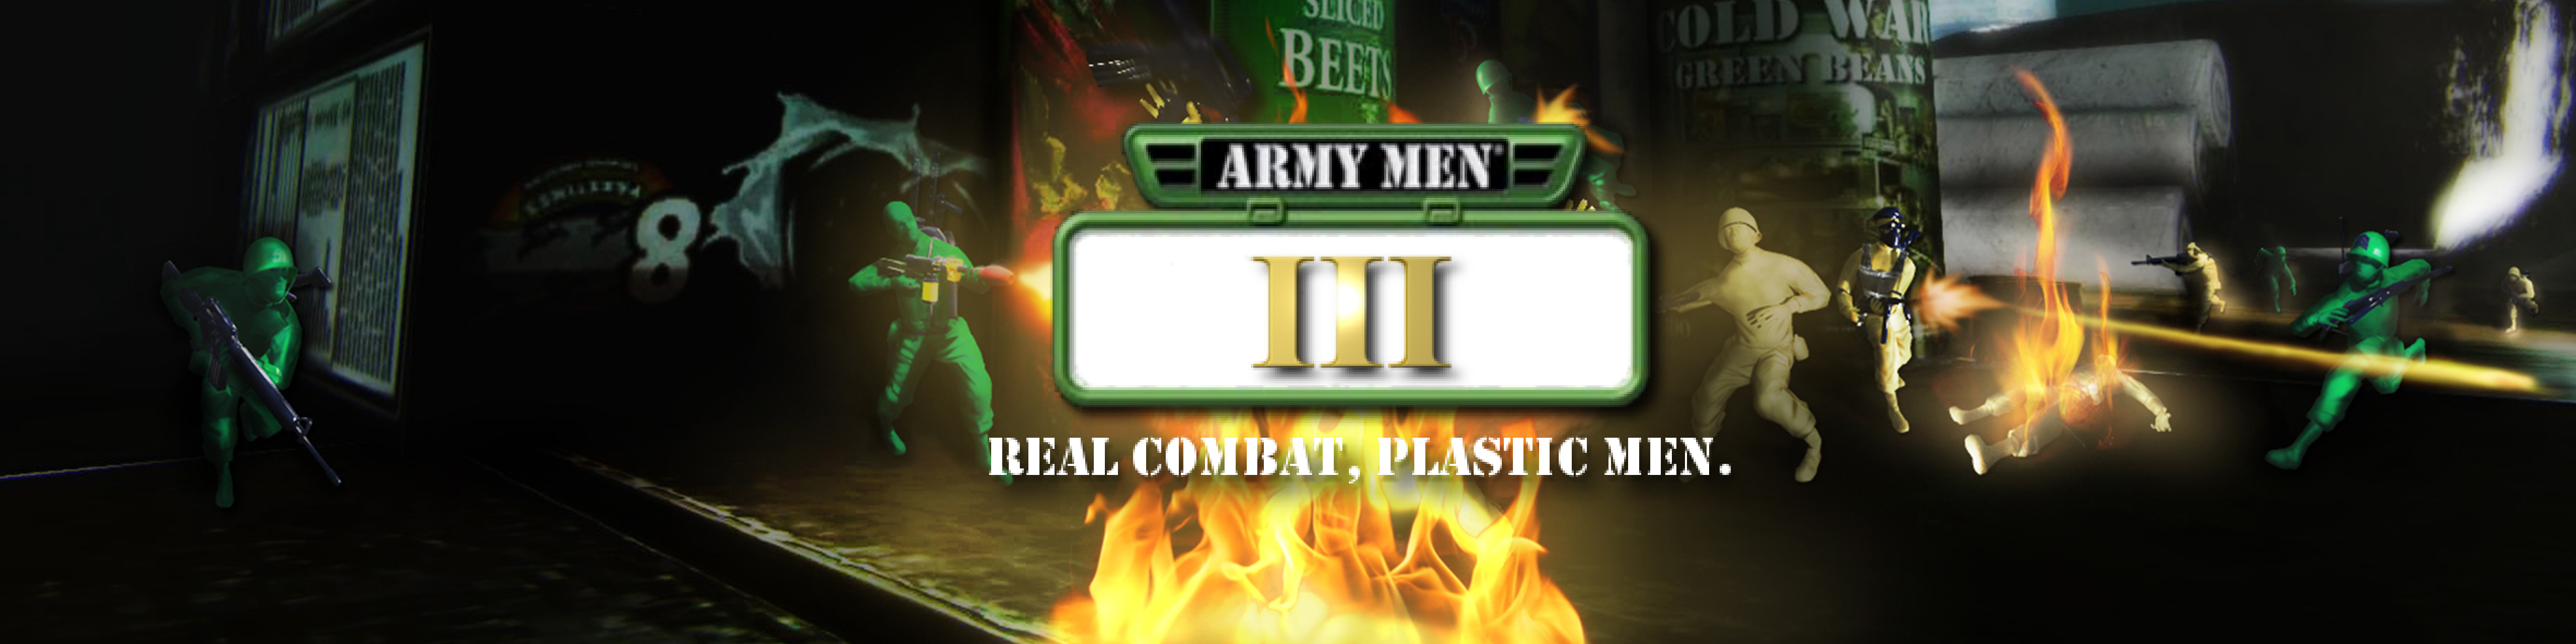 Army Men III